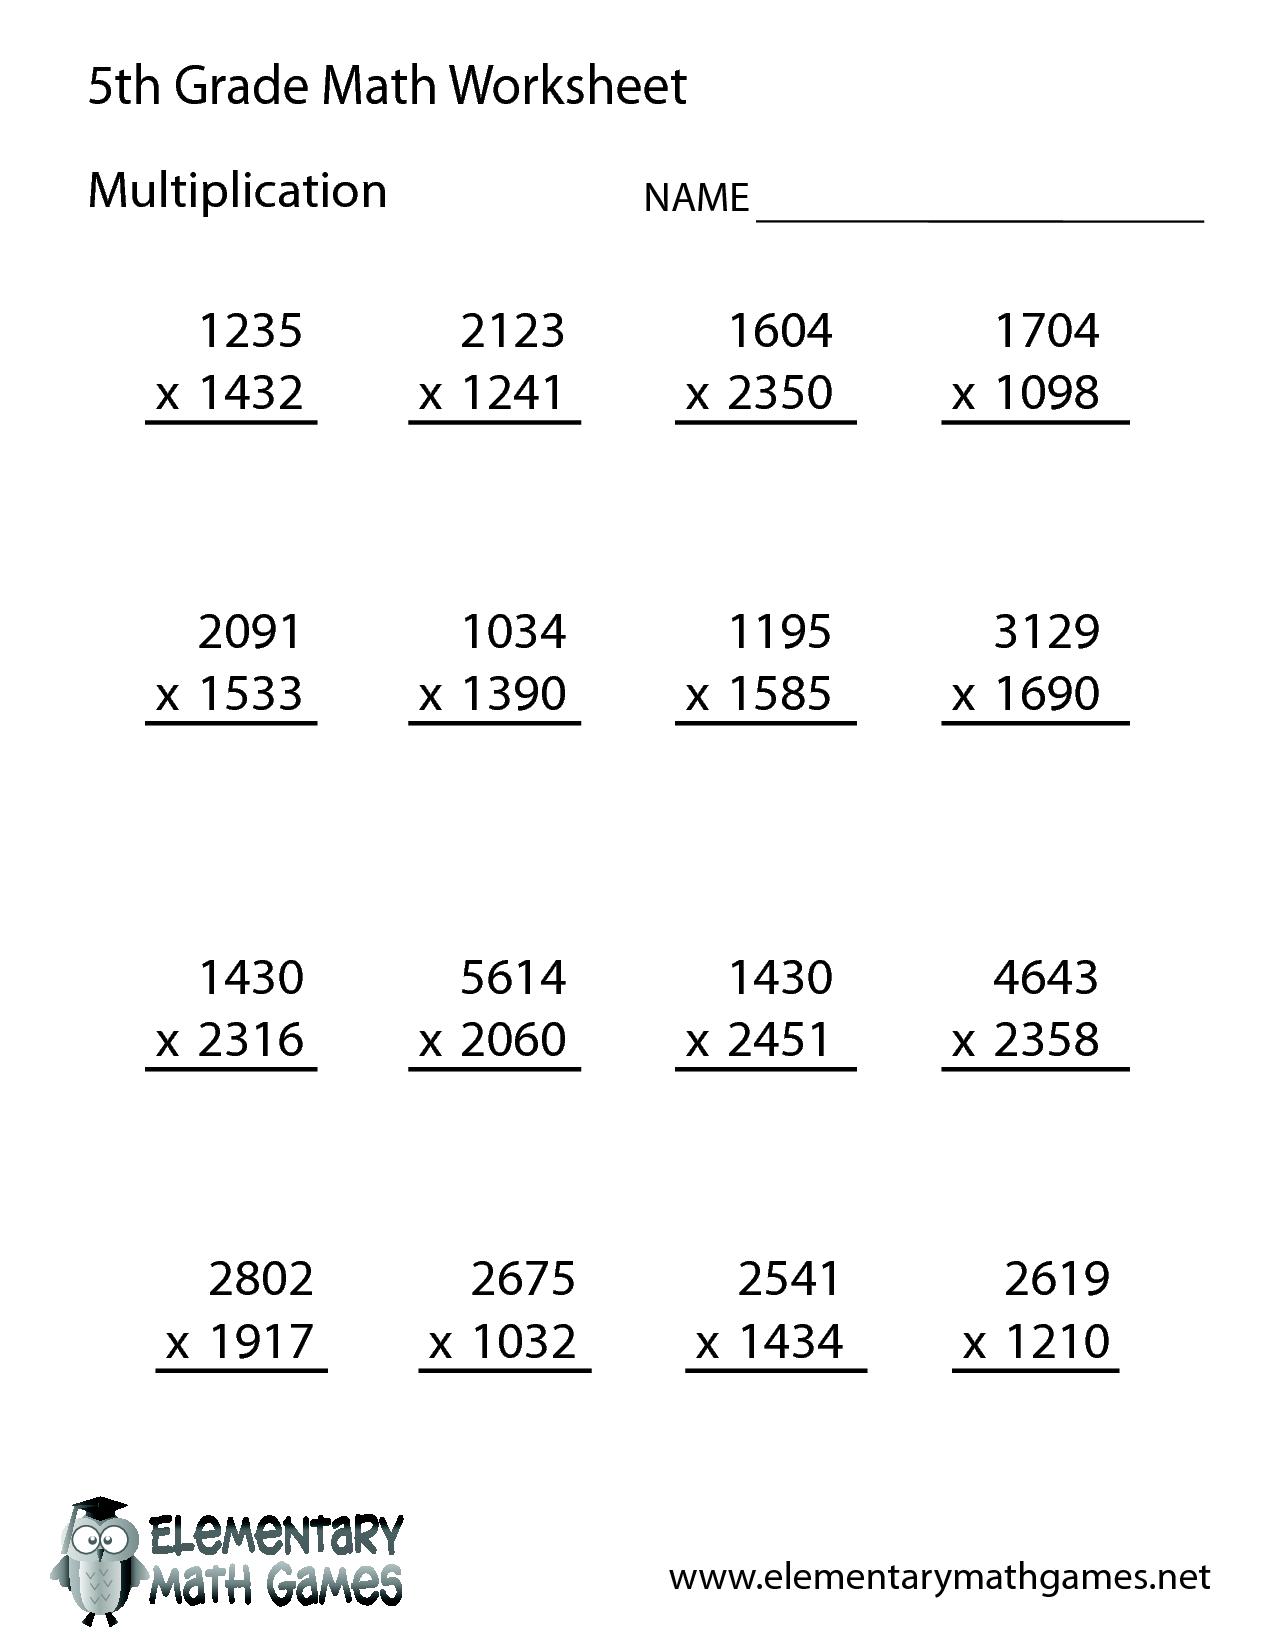 5th Grade Math Worksheets   5th Grade Math Worksheet   5th grade worksheets [ 1650 x 1275 Pixel ]